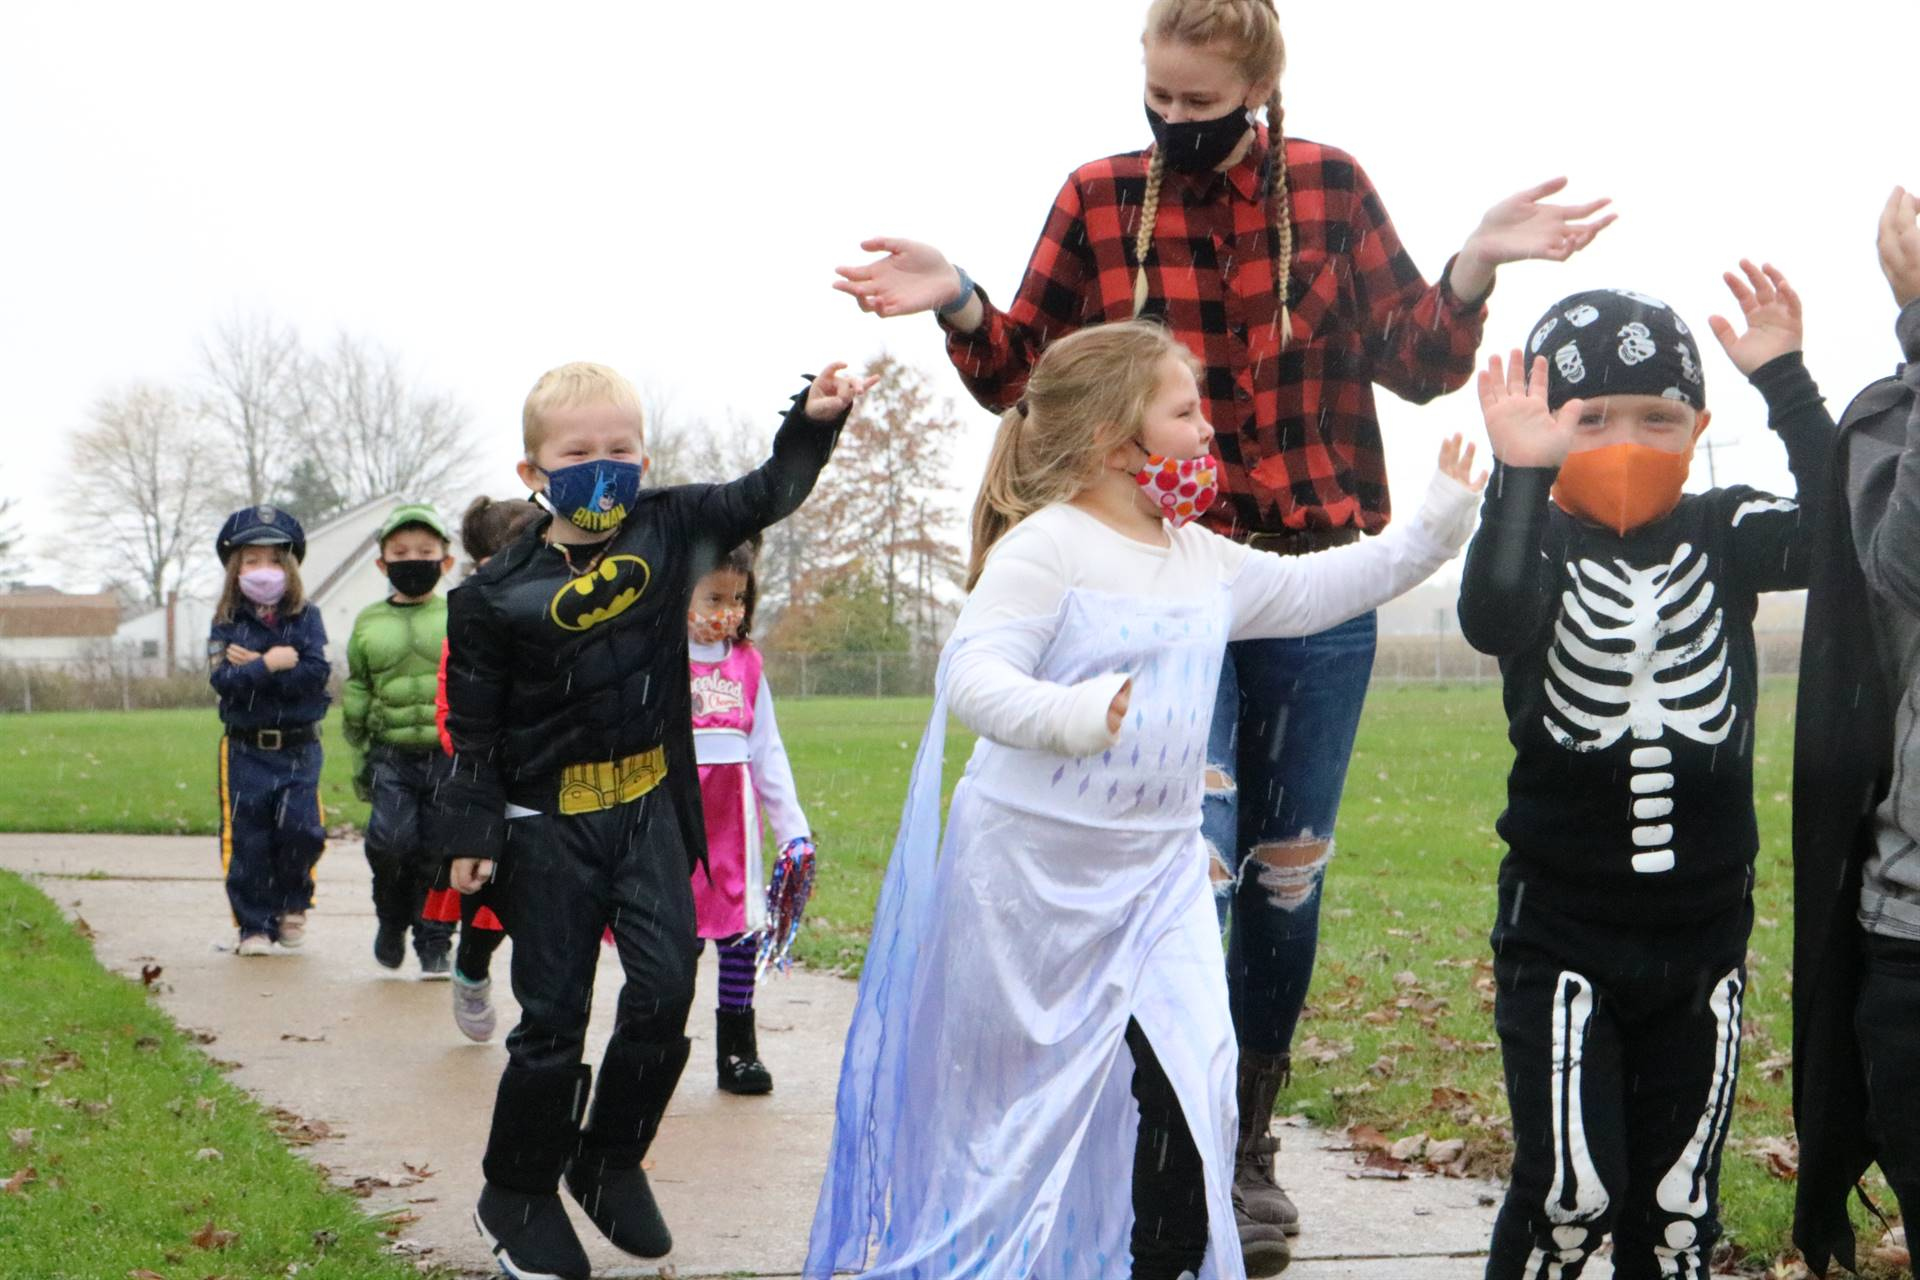 kids dressed up walking on sidewalk